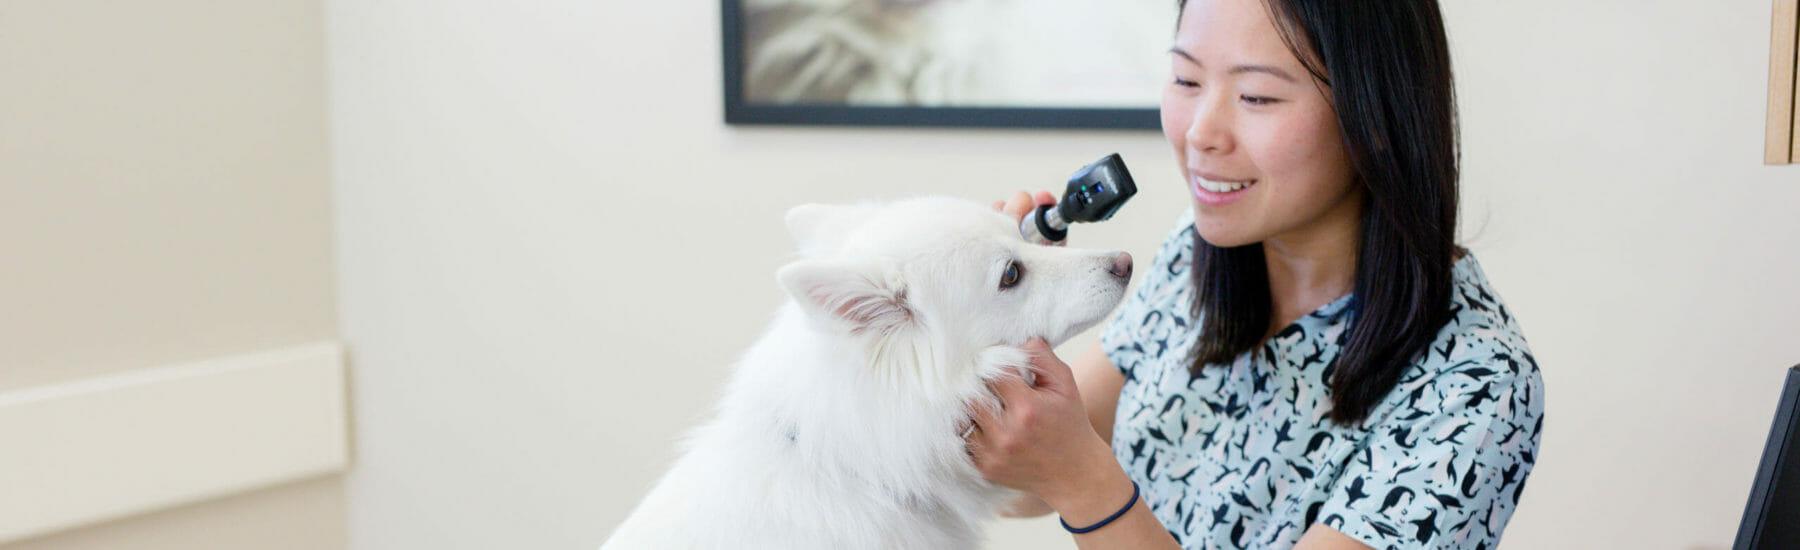 White dog getting an eye exam